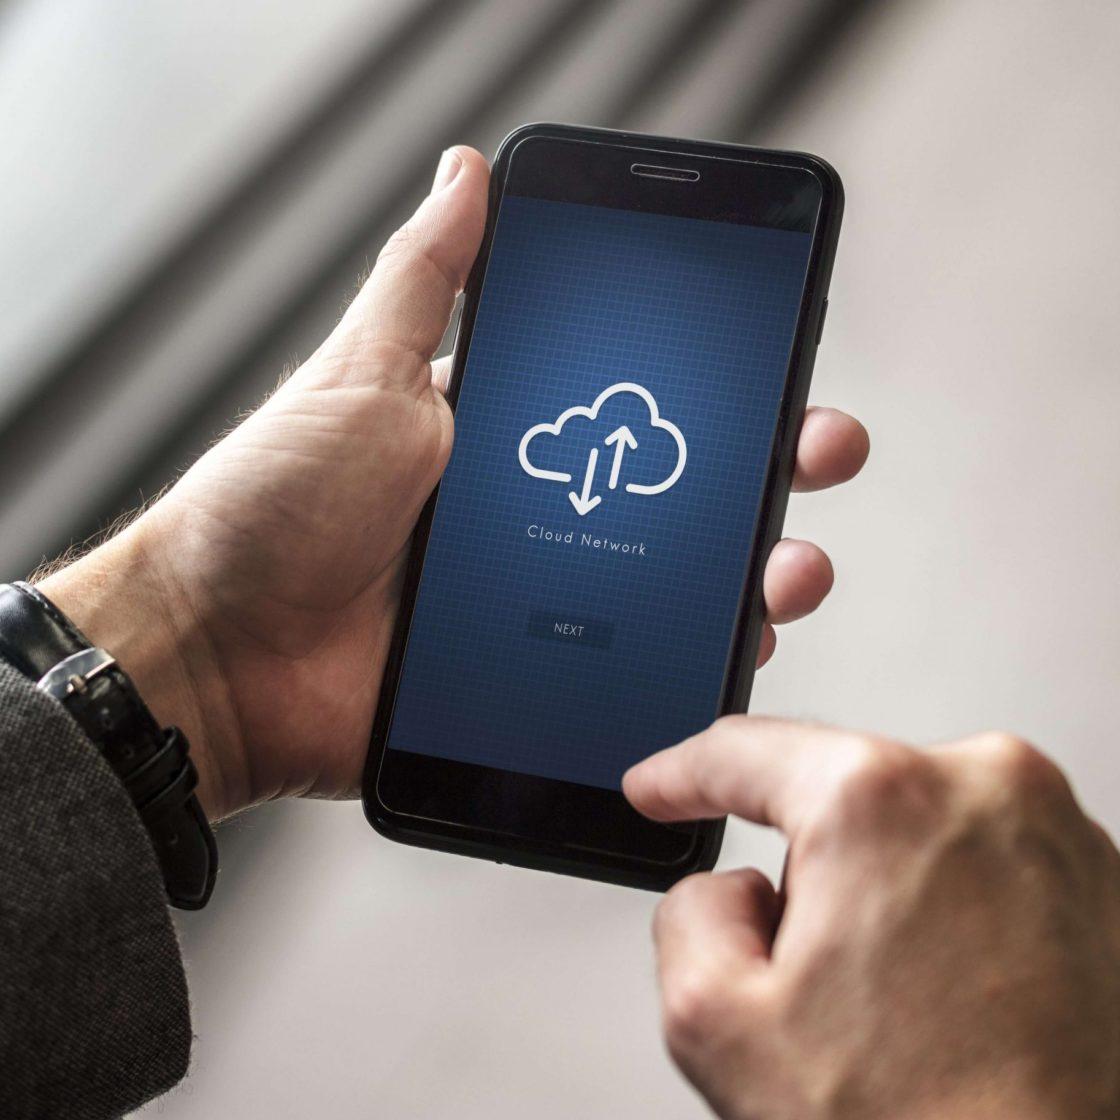 Umfassendes Angebot an Cloud-Lösungen